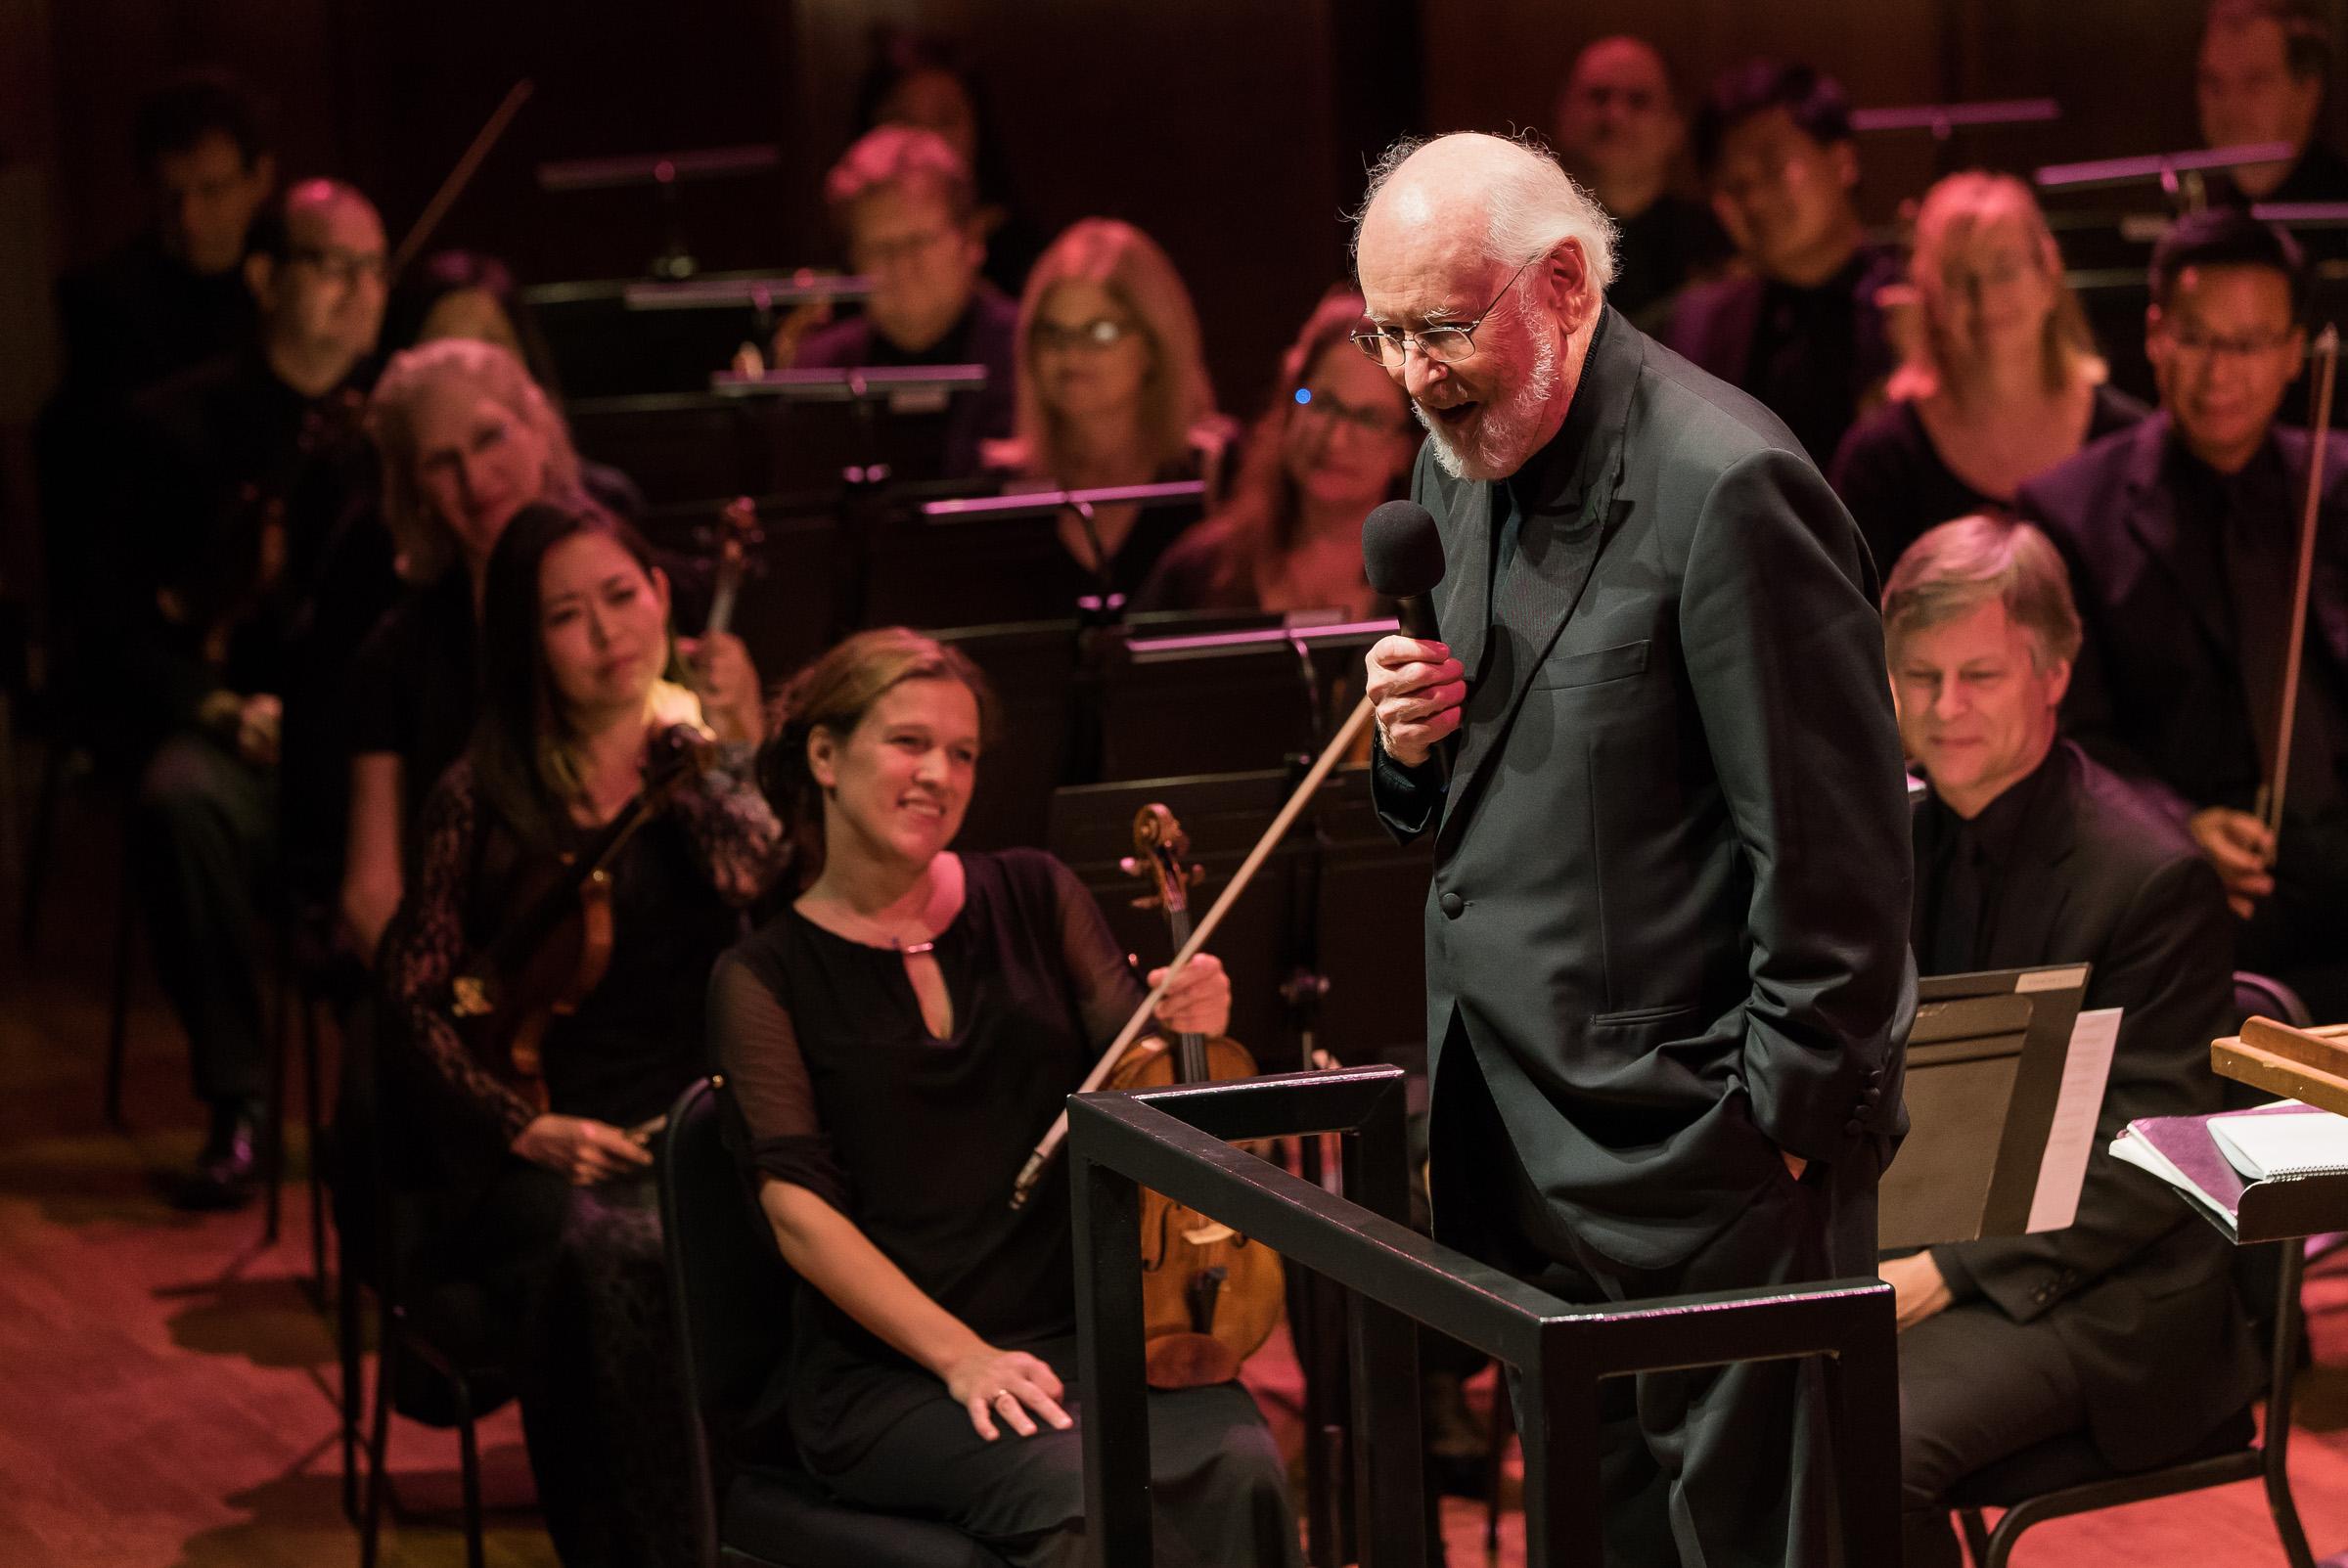 brandon_patoc_john_williams_Steven_Spielberg, Seattle_Symphony_Orchestra_Conert_0010.JPG